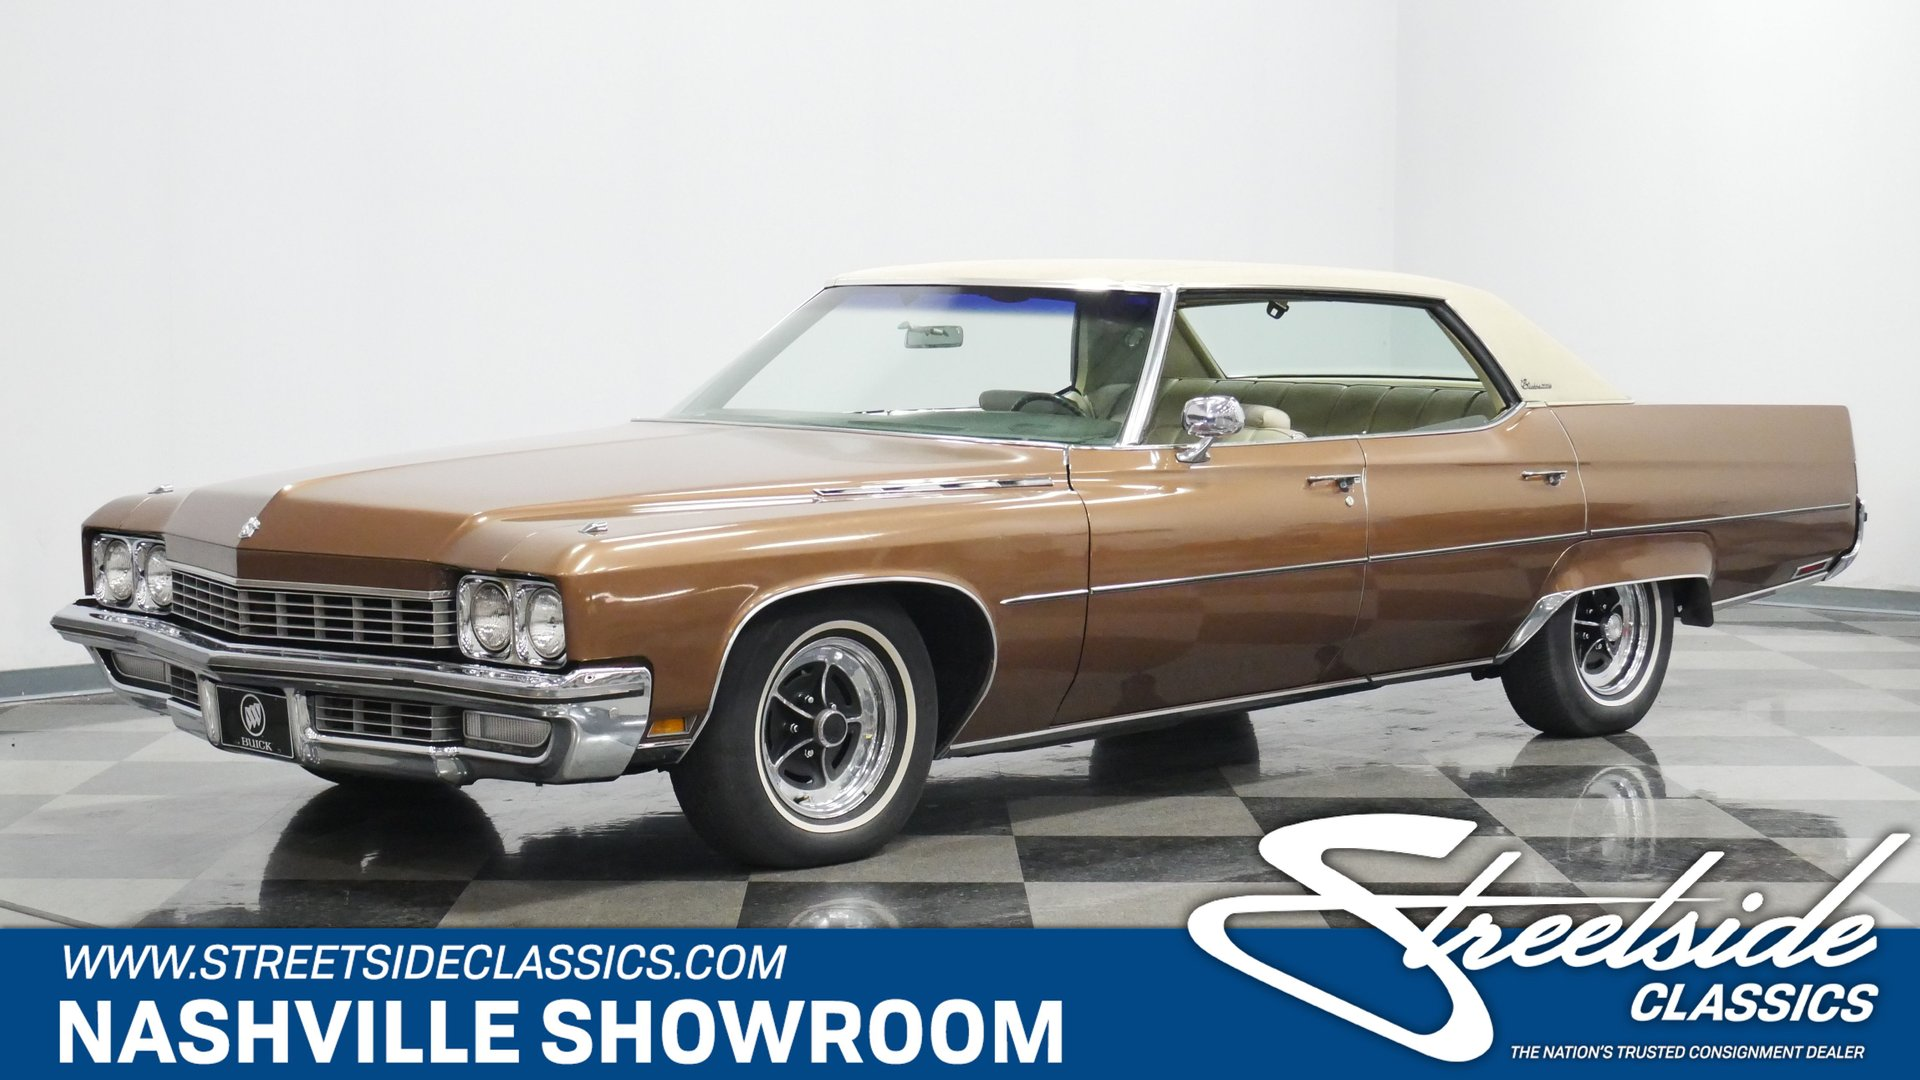 1972 buick electra 225 custom